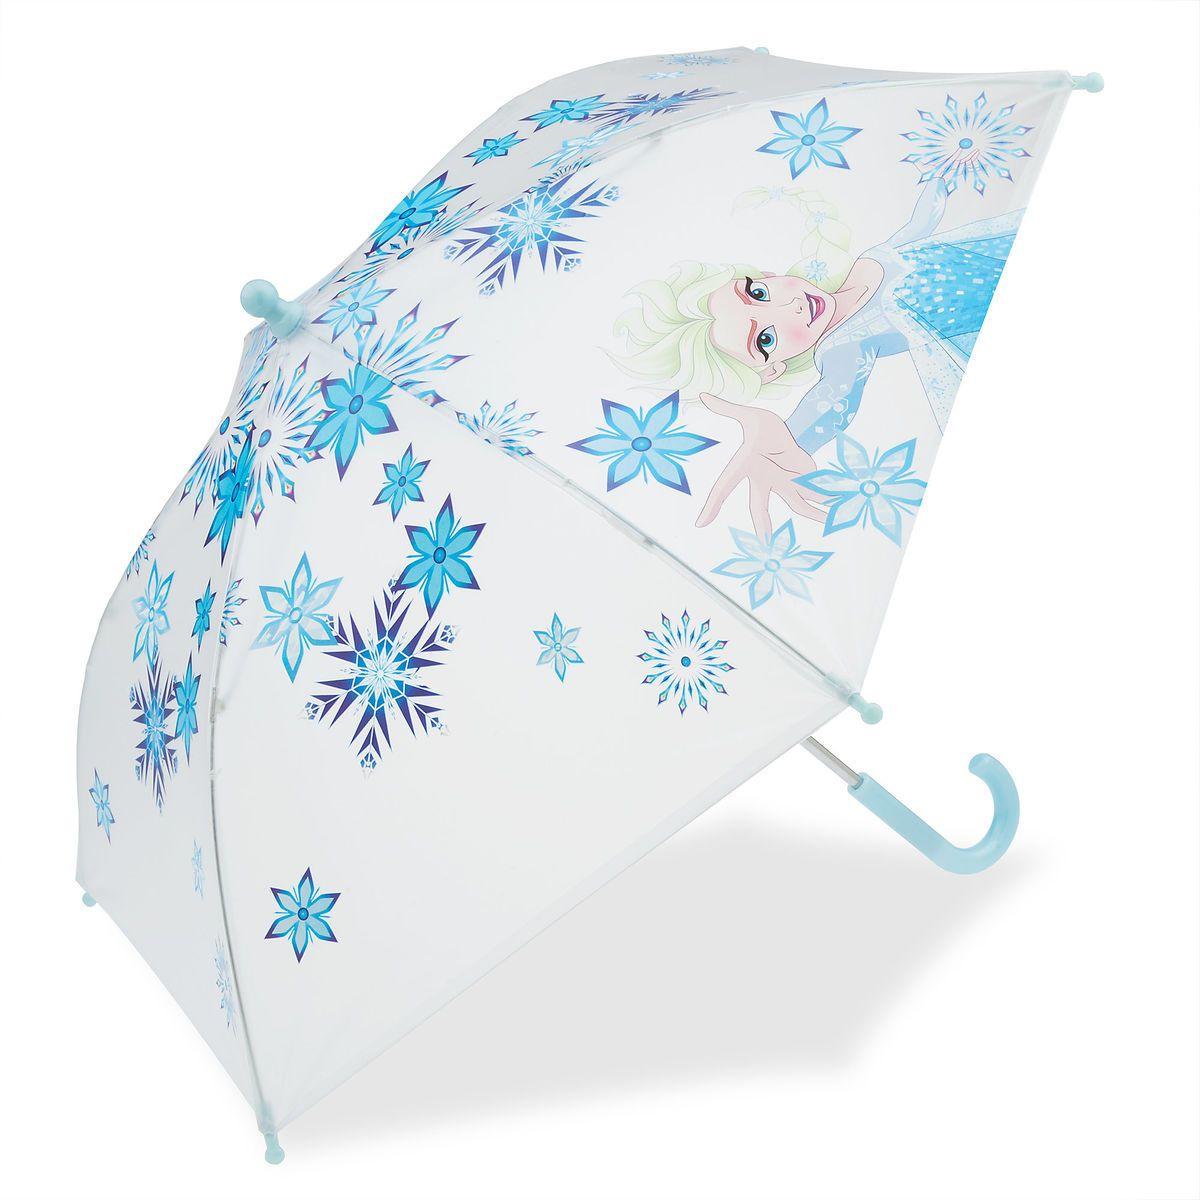 Umbrella Children Kids Elsa Anna Frozen Character Girl Illuminating Lighting Up